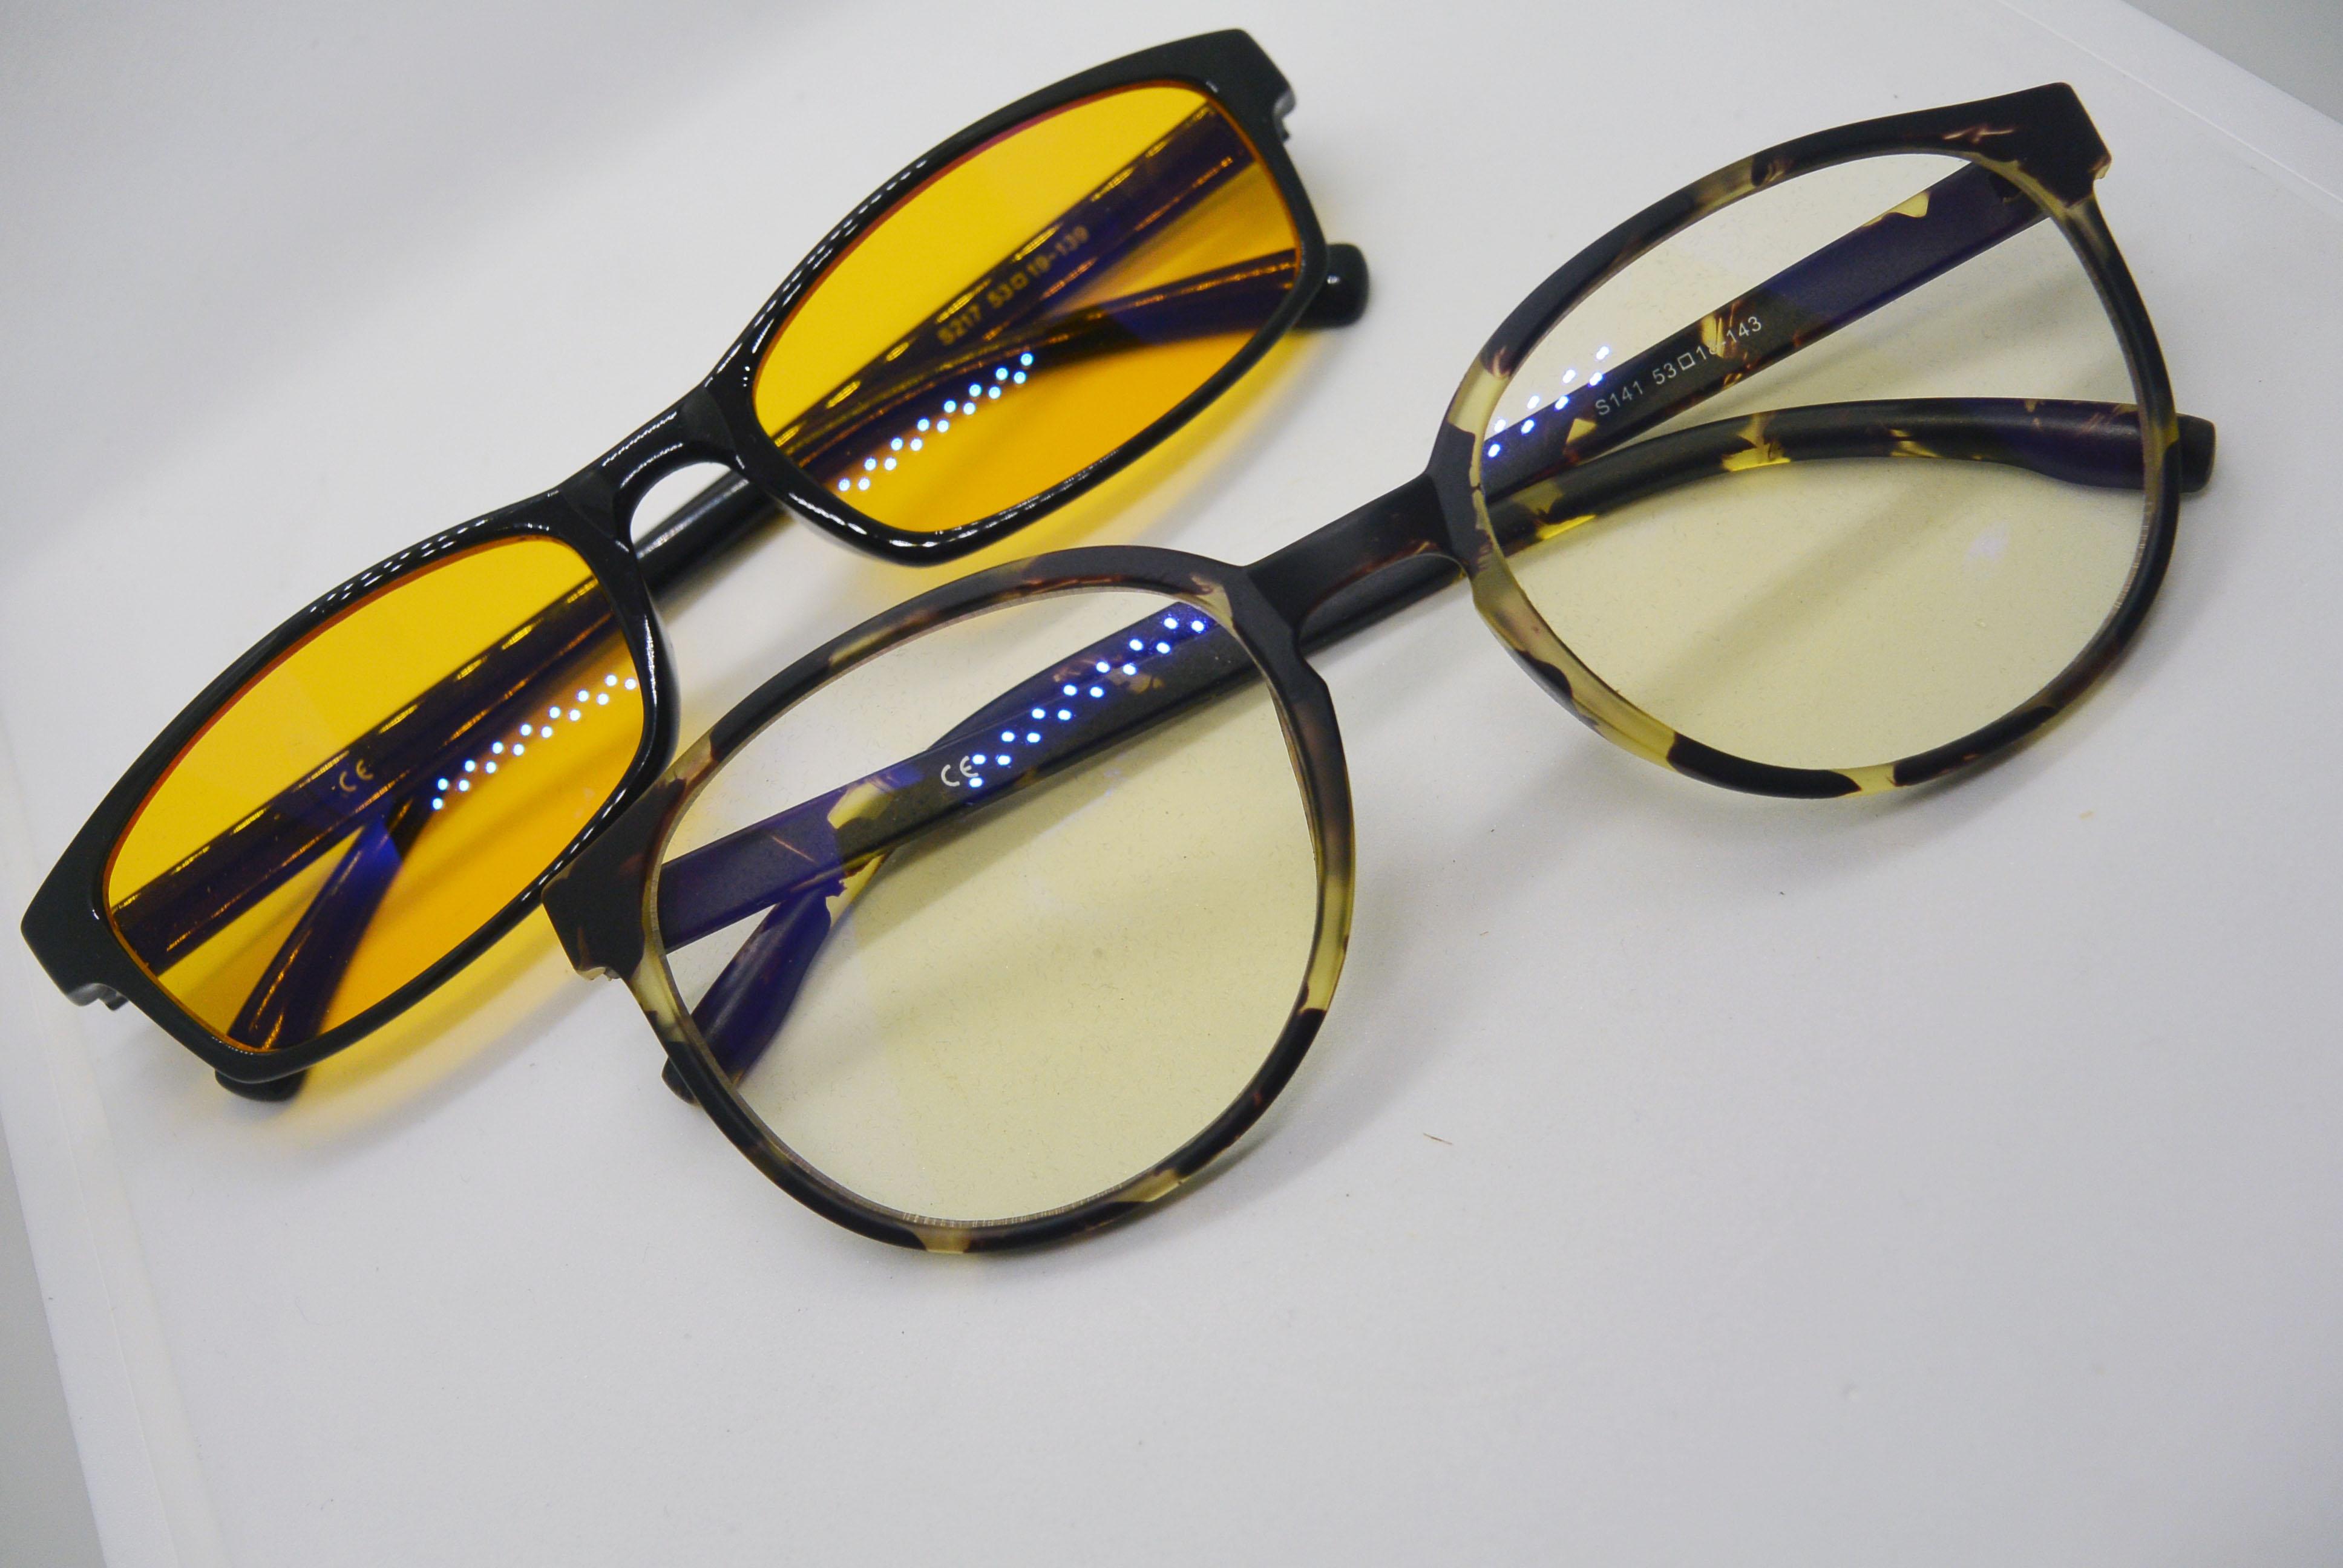 Spektrum Glasses Review River City Belle